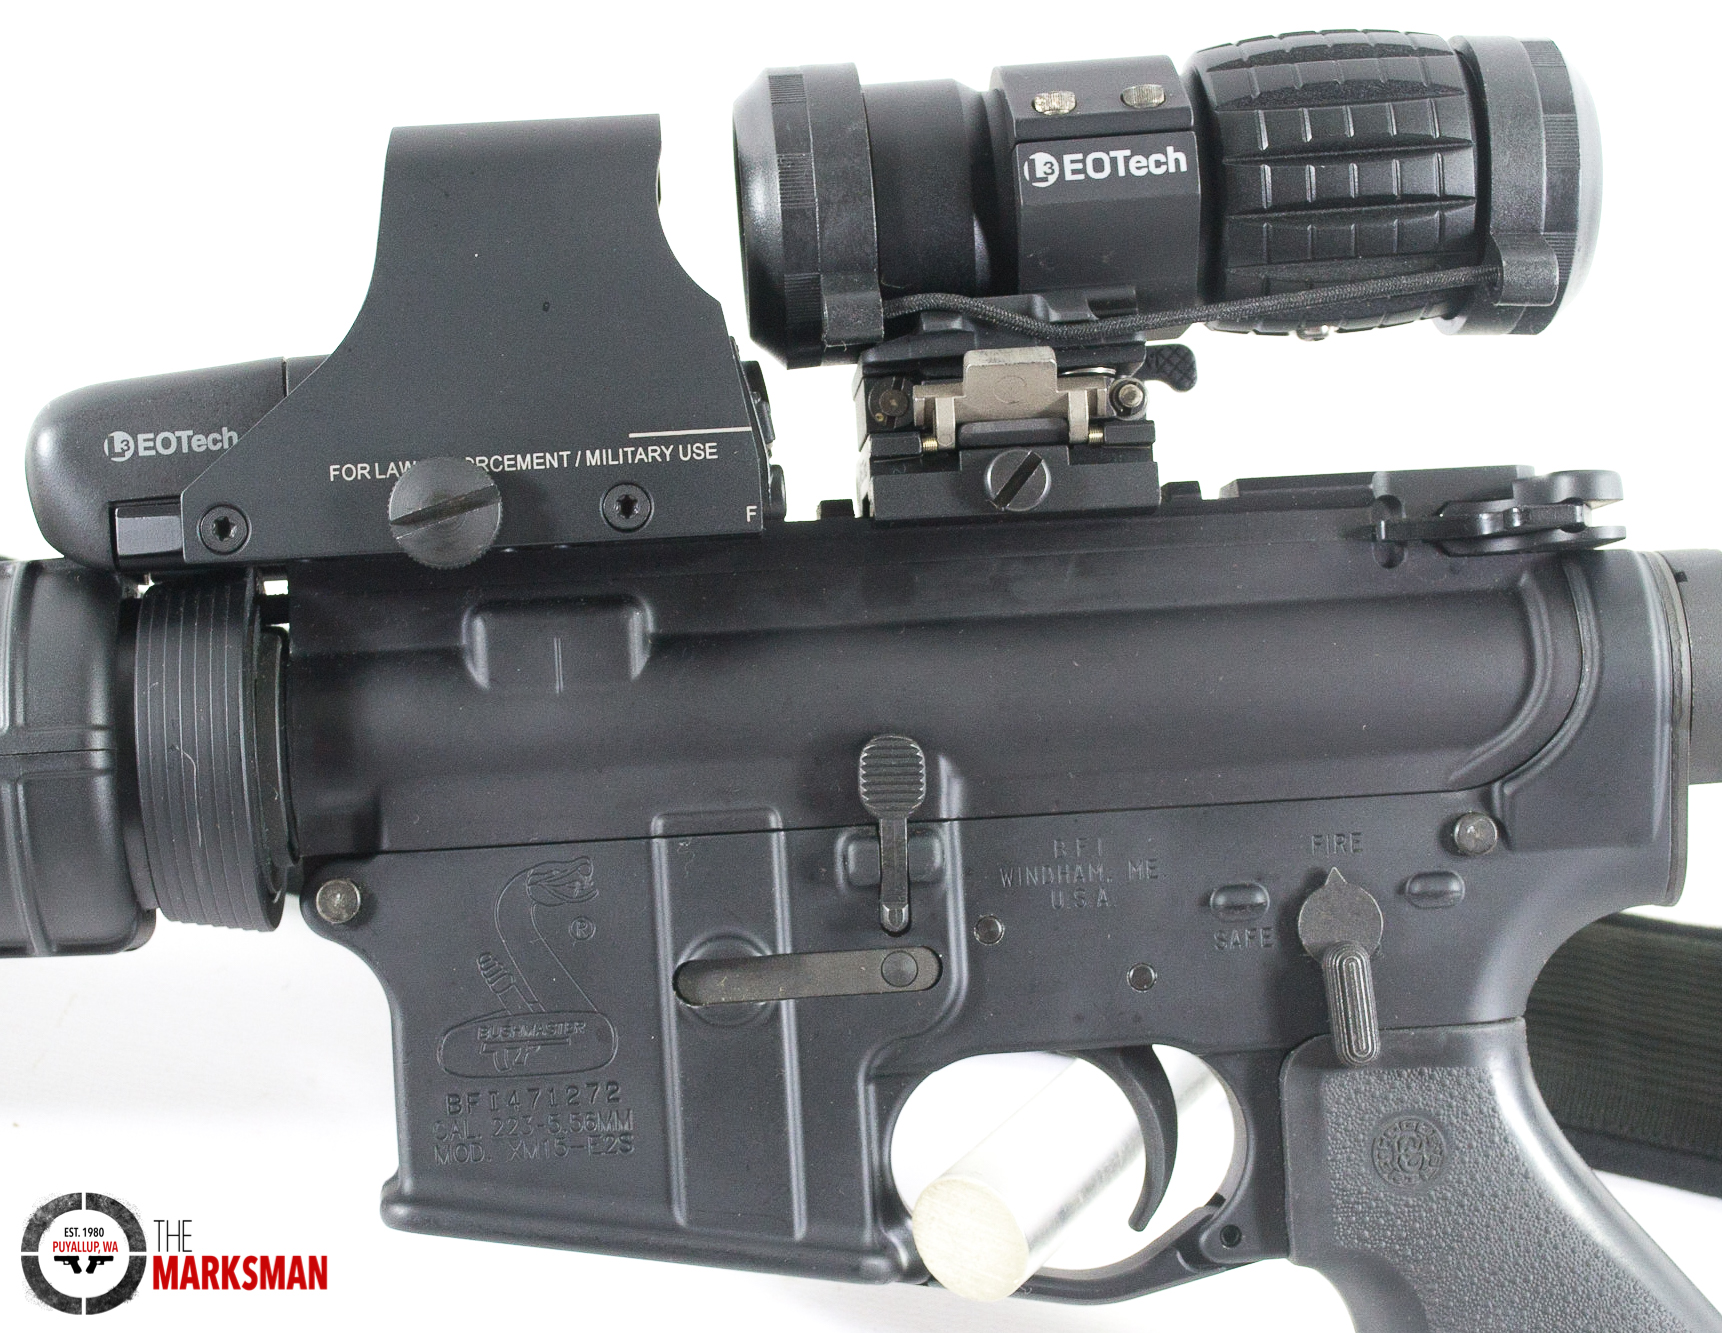 Bushmaster XM15 AR-15, 5 56mm NATO, Used - Semi Auto Rifles at